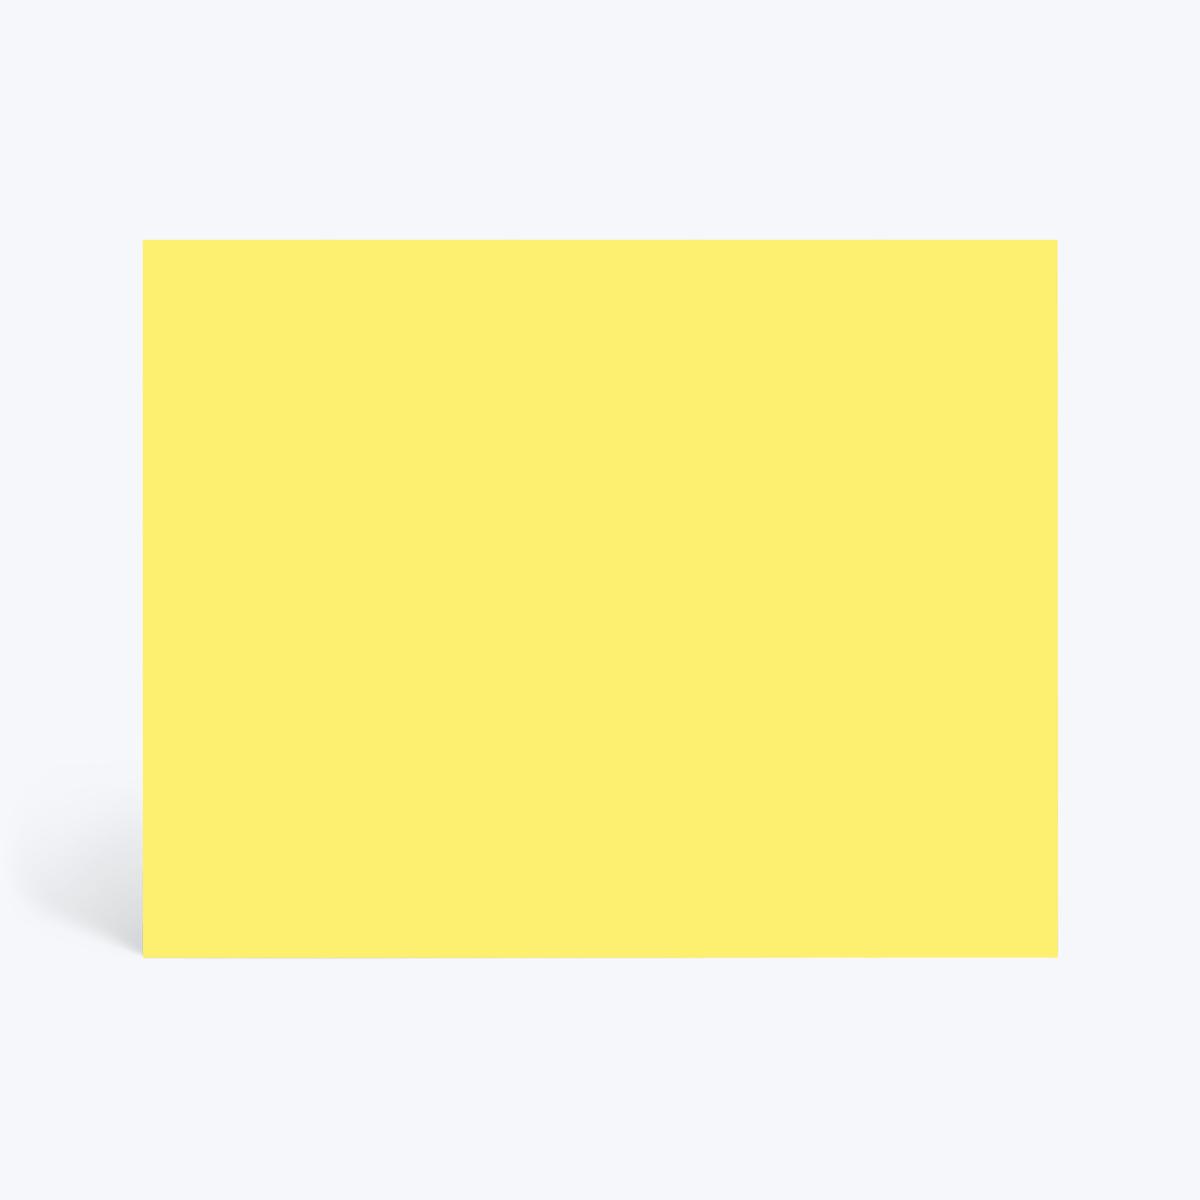 Https%3a%2f%2fwww.papier.com%2fproduct image%2f42694%2f29%2fcolour block 10900 back 1533567348.png?ixlib=rb 1.1